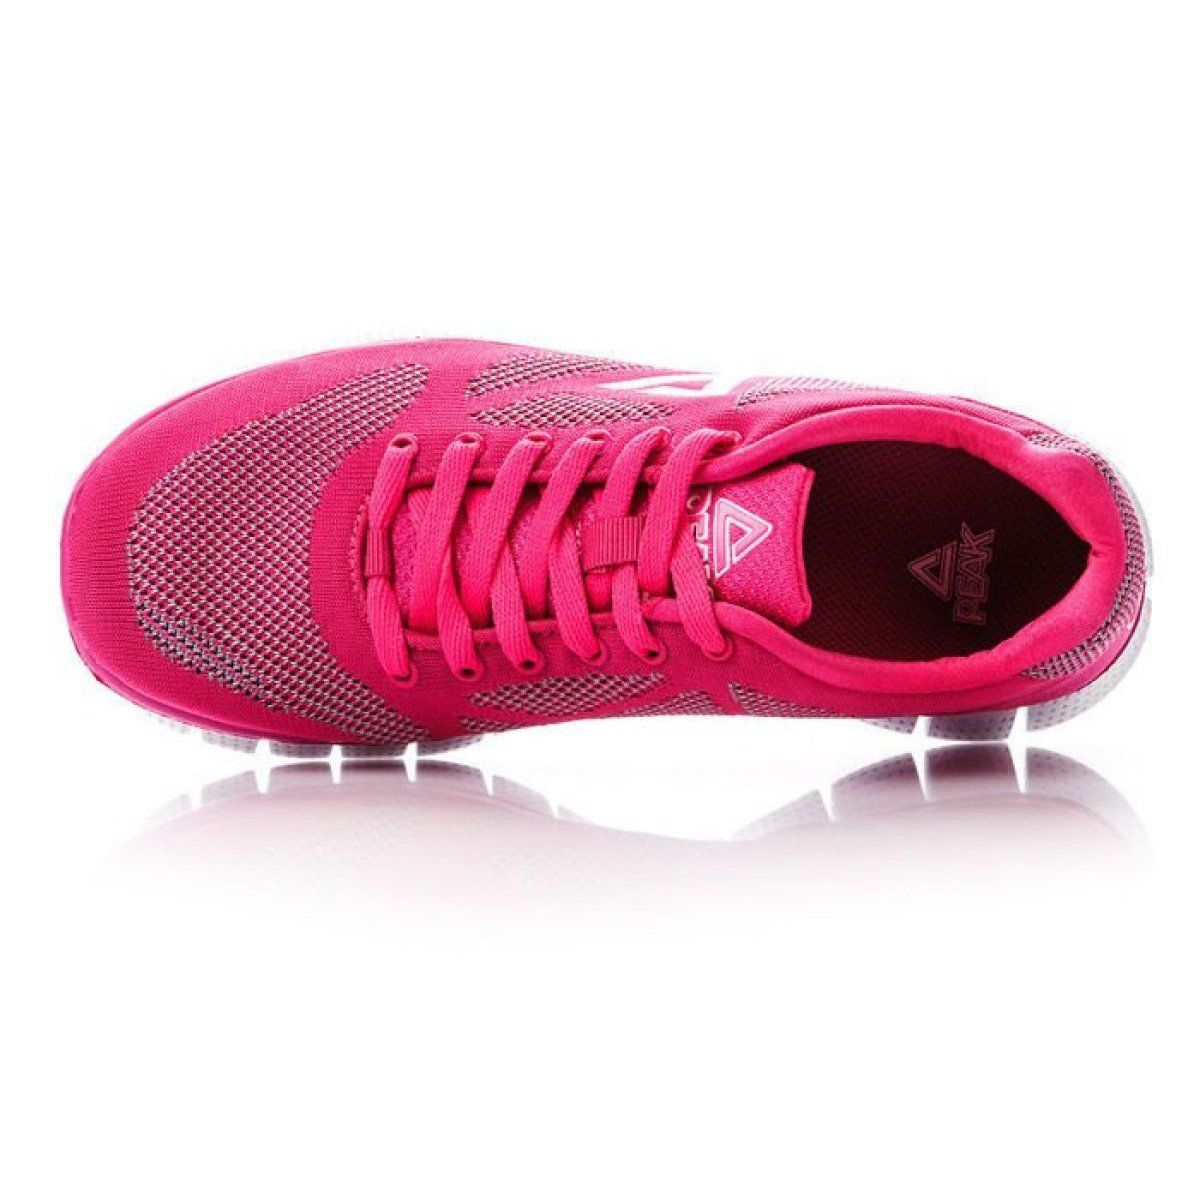 Buty Biegowe Peak E41308h W Pe00375 Pe00380 Rozowe Sport Shoes Shoes Superga Sneaker